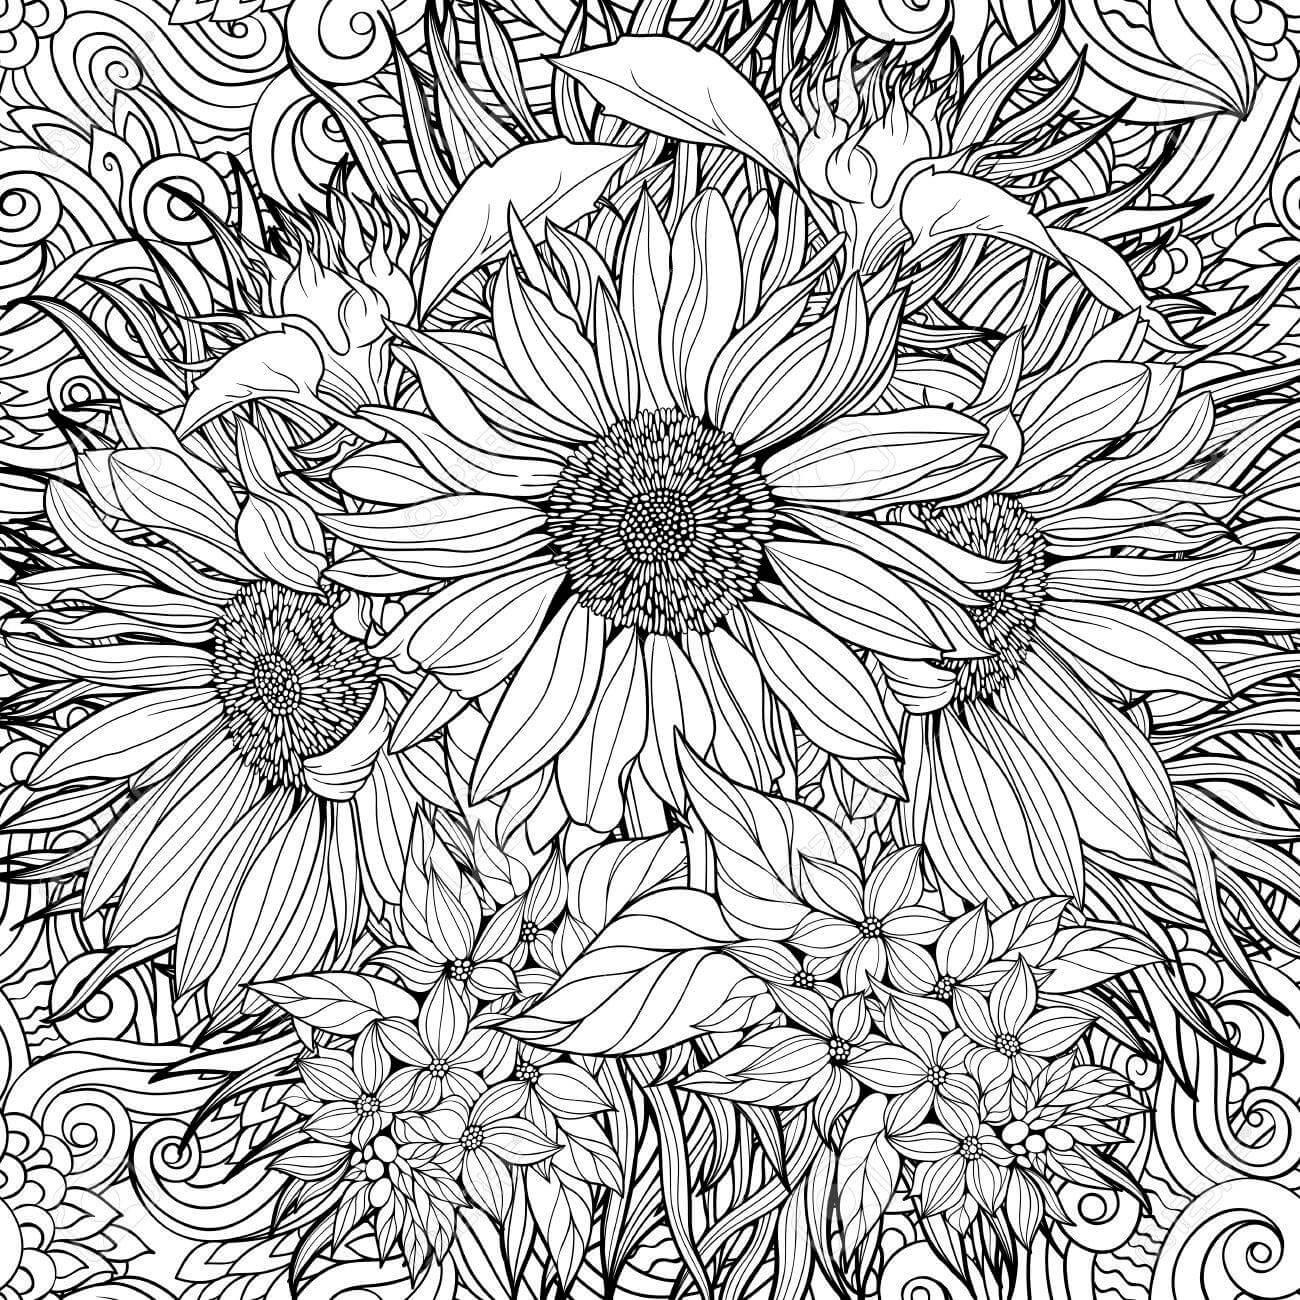 Dibujos Para Dibujar Dificiles Y Bonitos Djdareve Com